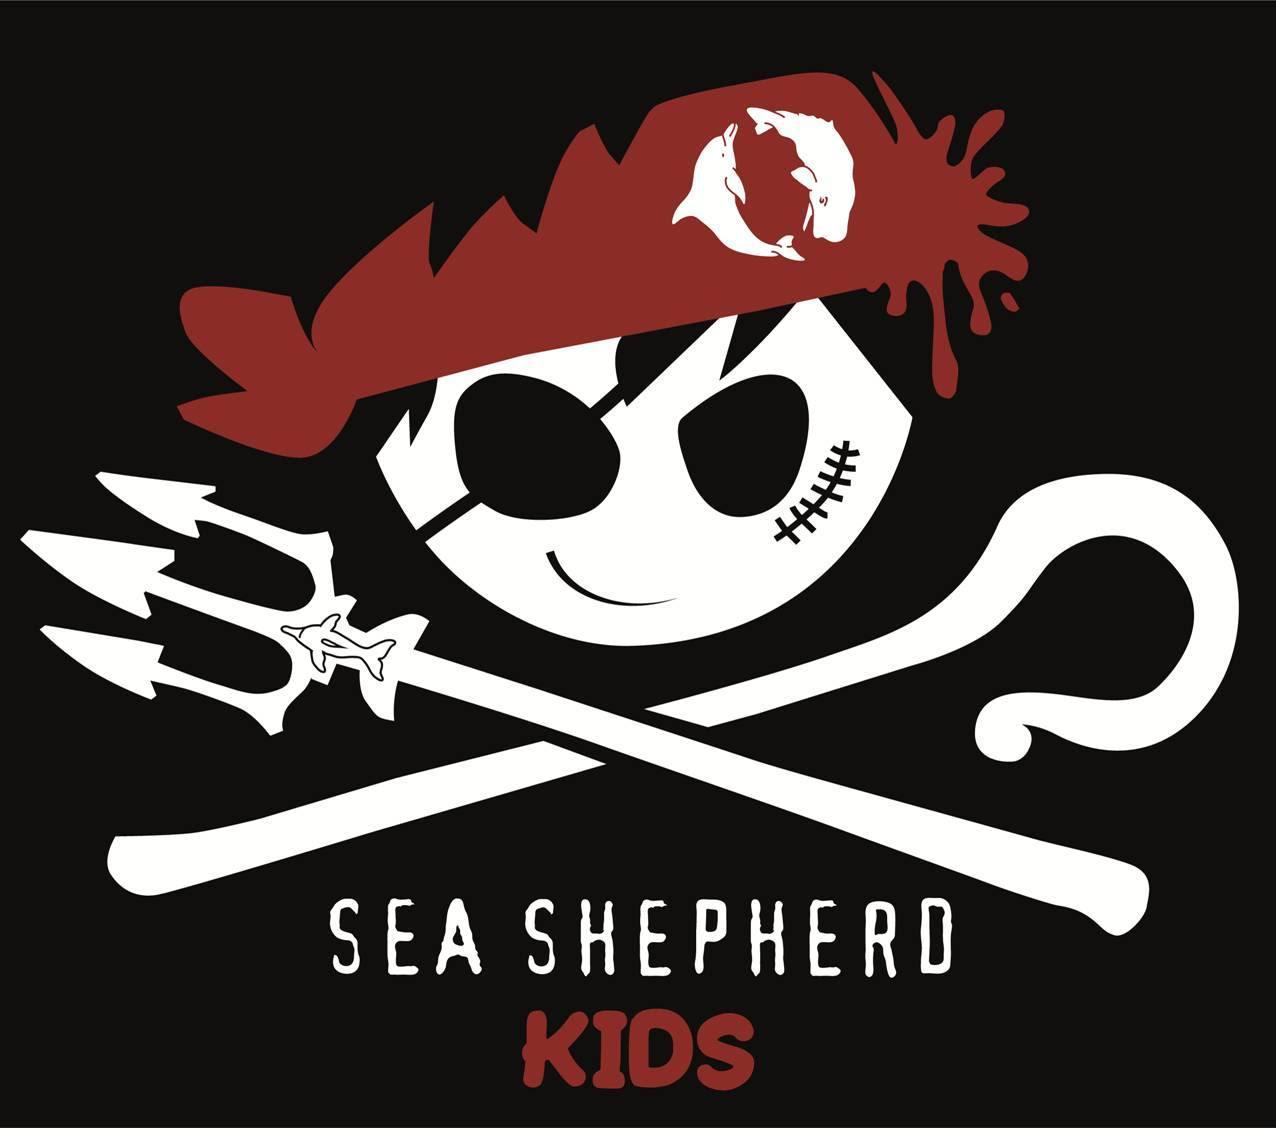 SEA SHEPHERD kids enfants ateliers océan environnement écologie